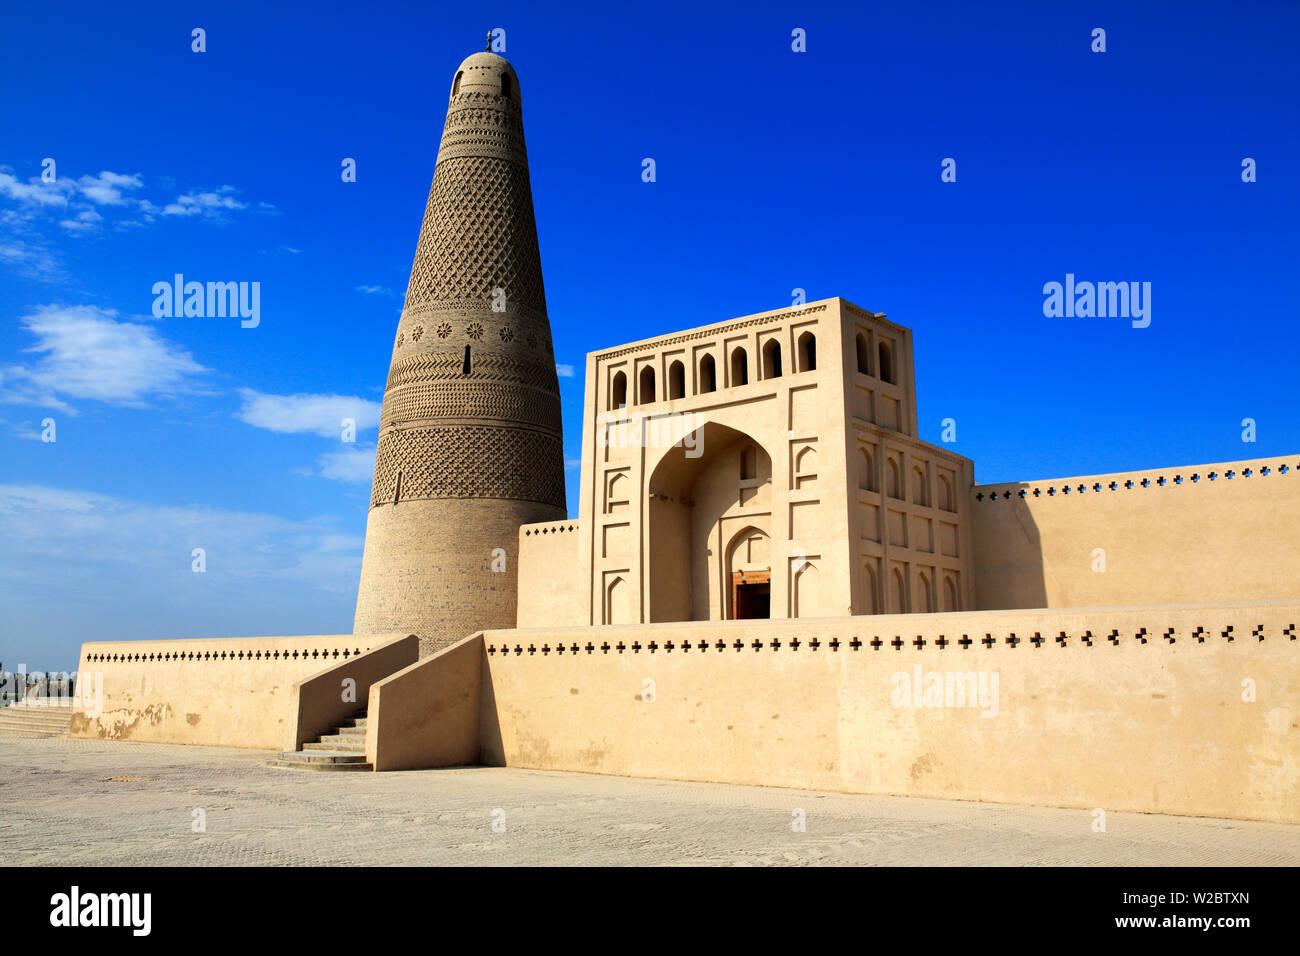 Emin Minaret (1779), Turpan, Turpan Prefecture, Xinjiang Uyghur Autonomous Region, China - Stock Image